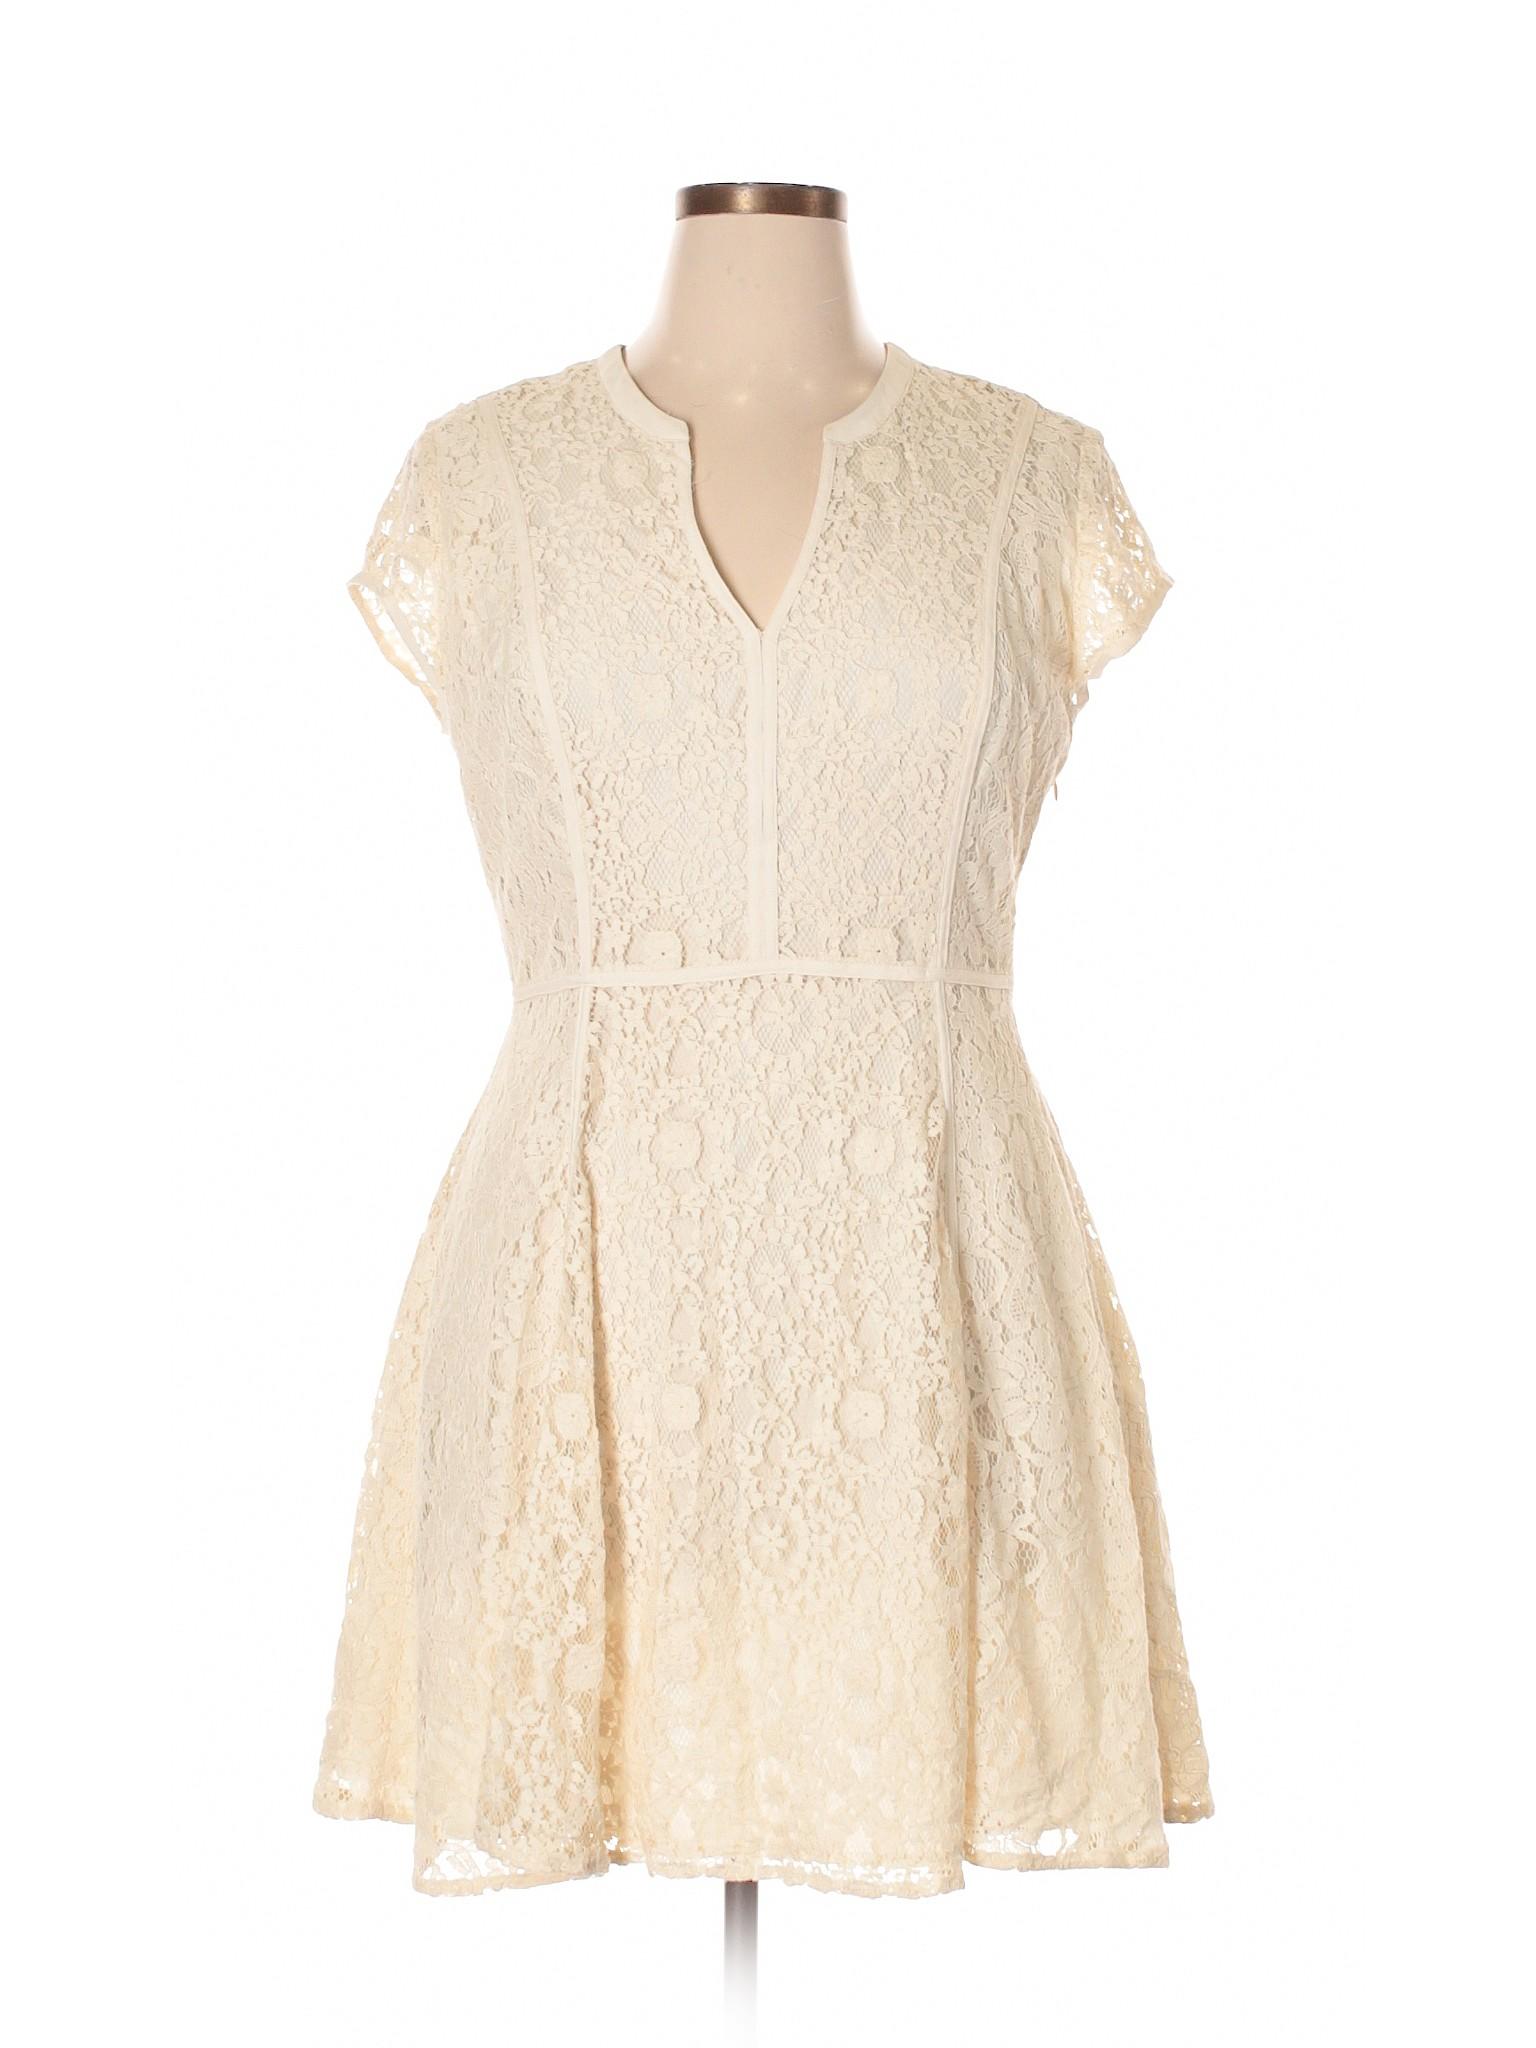 Casual Dress Boutique Lauren LC winter Conrad w7xIAUq